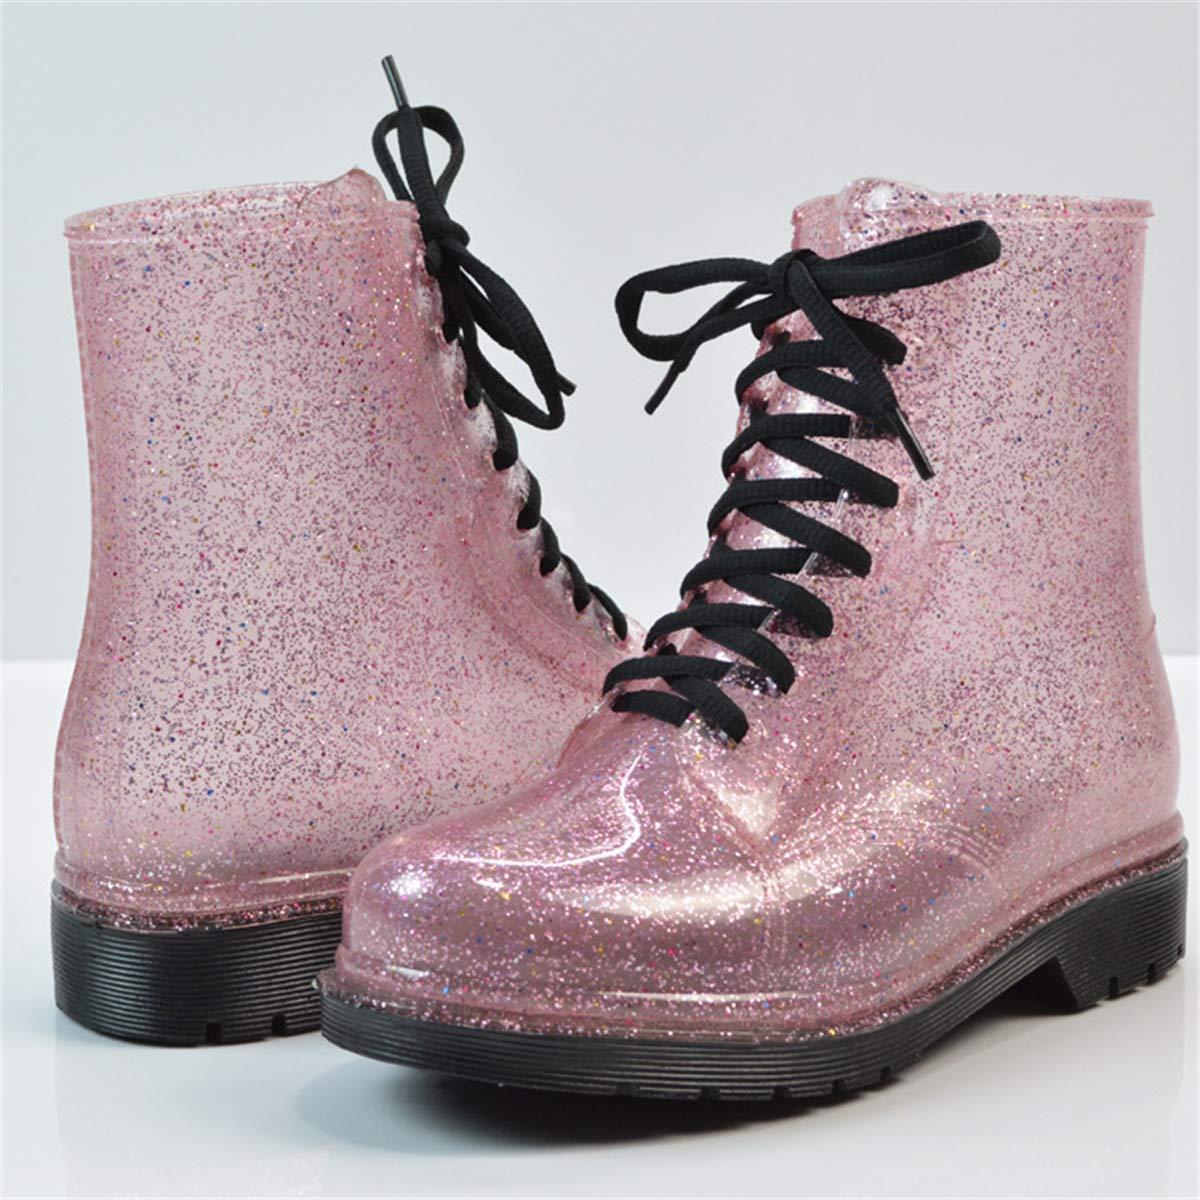 Womens Tube Fashion Shoes Non-Slip Boots Martin Boots rain Boots